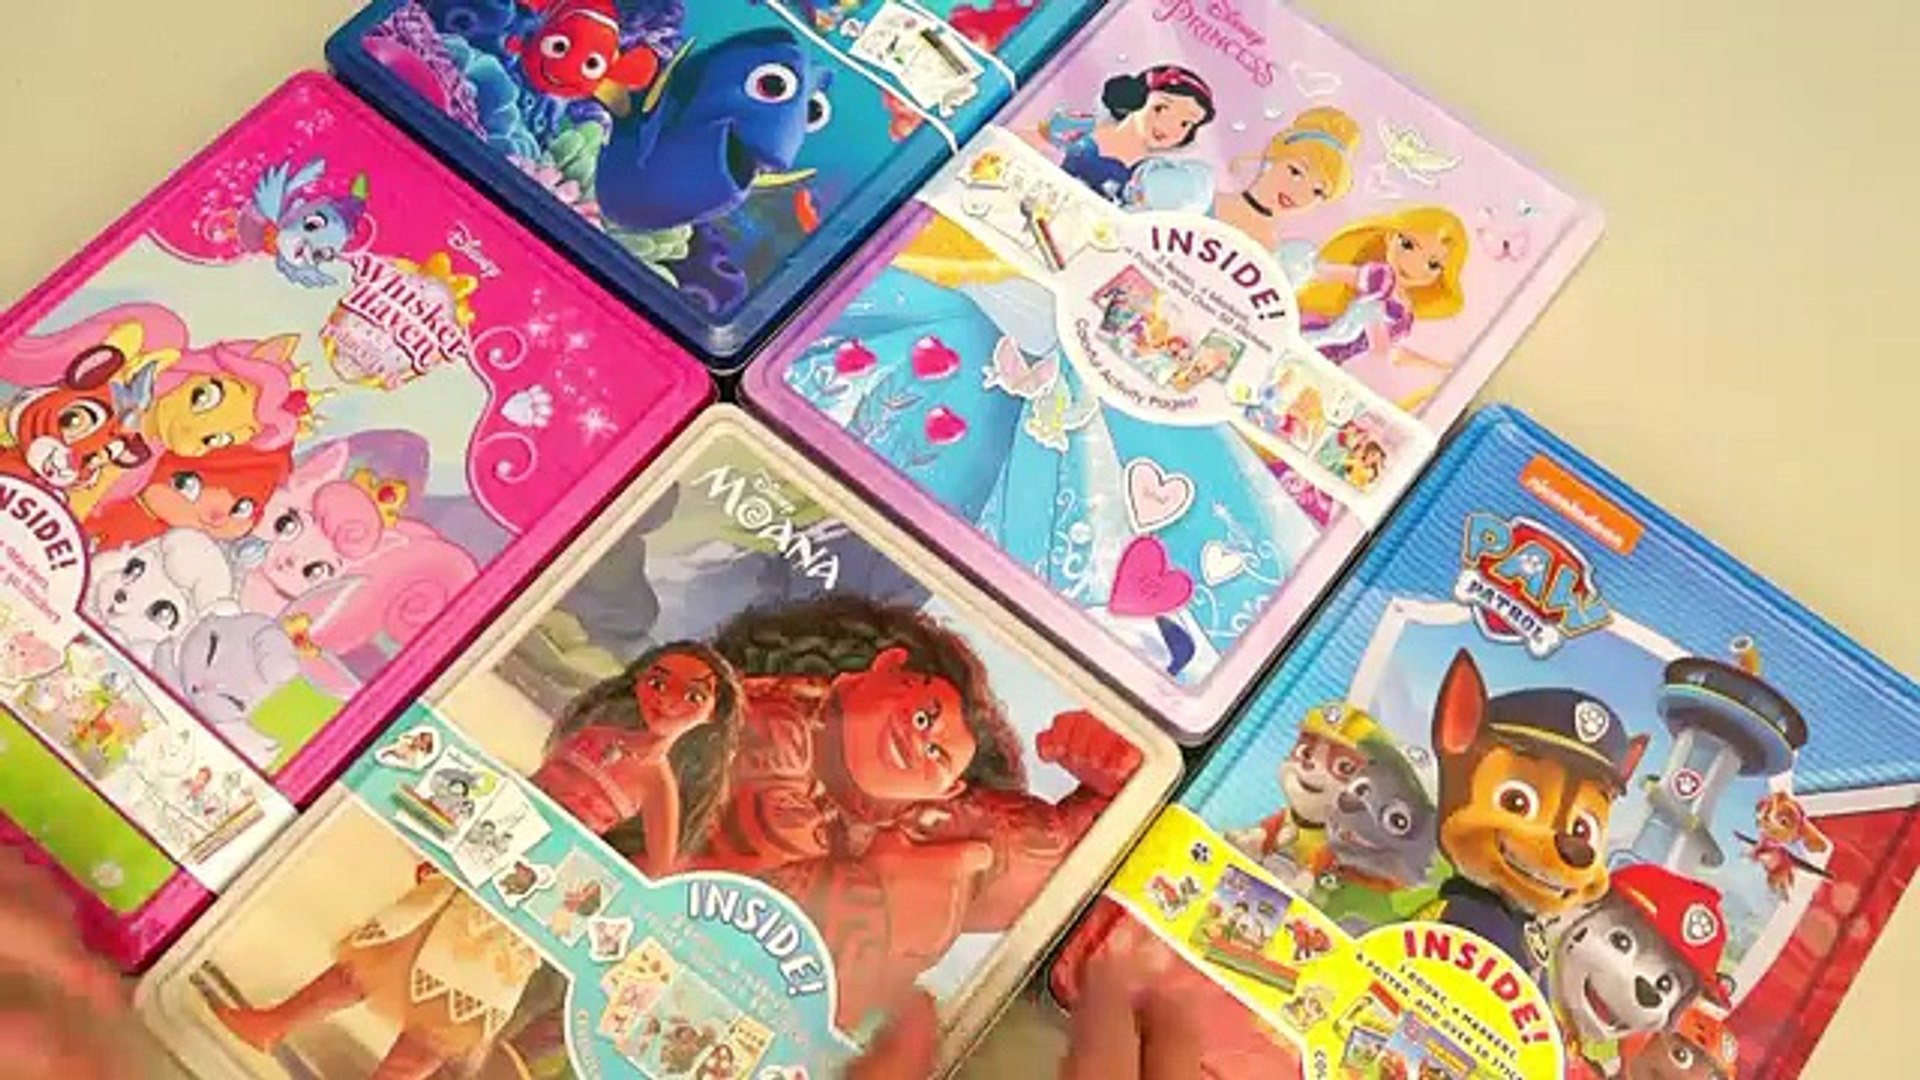 Juguetes En Español Para Colorear De Princesas Disney Patrulla Canina Moana Y Buscando A Dory